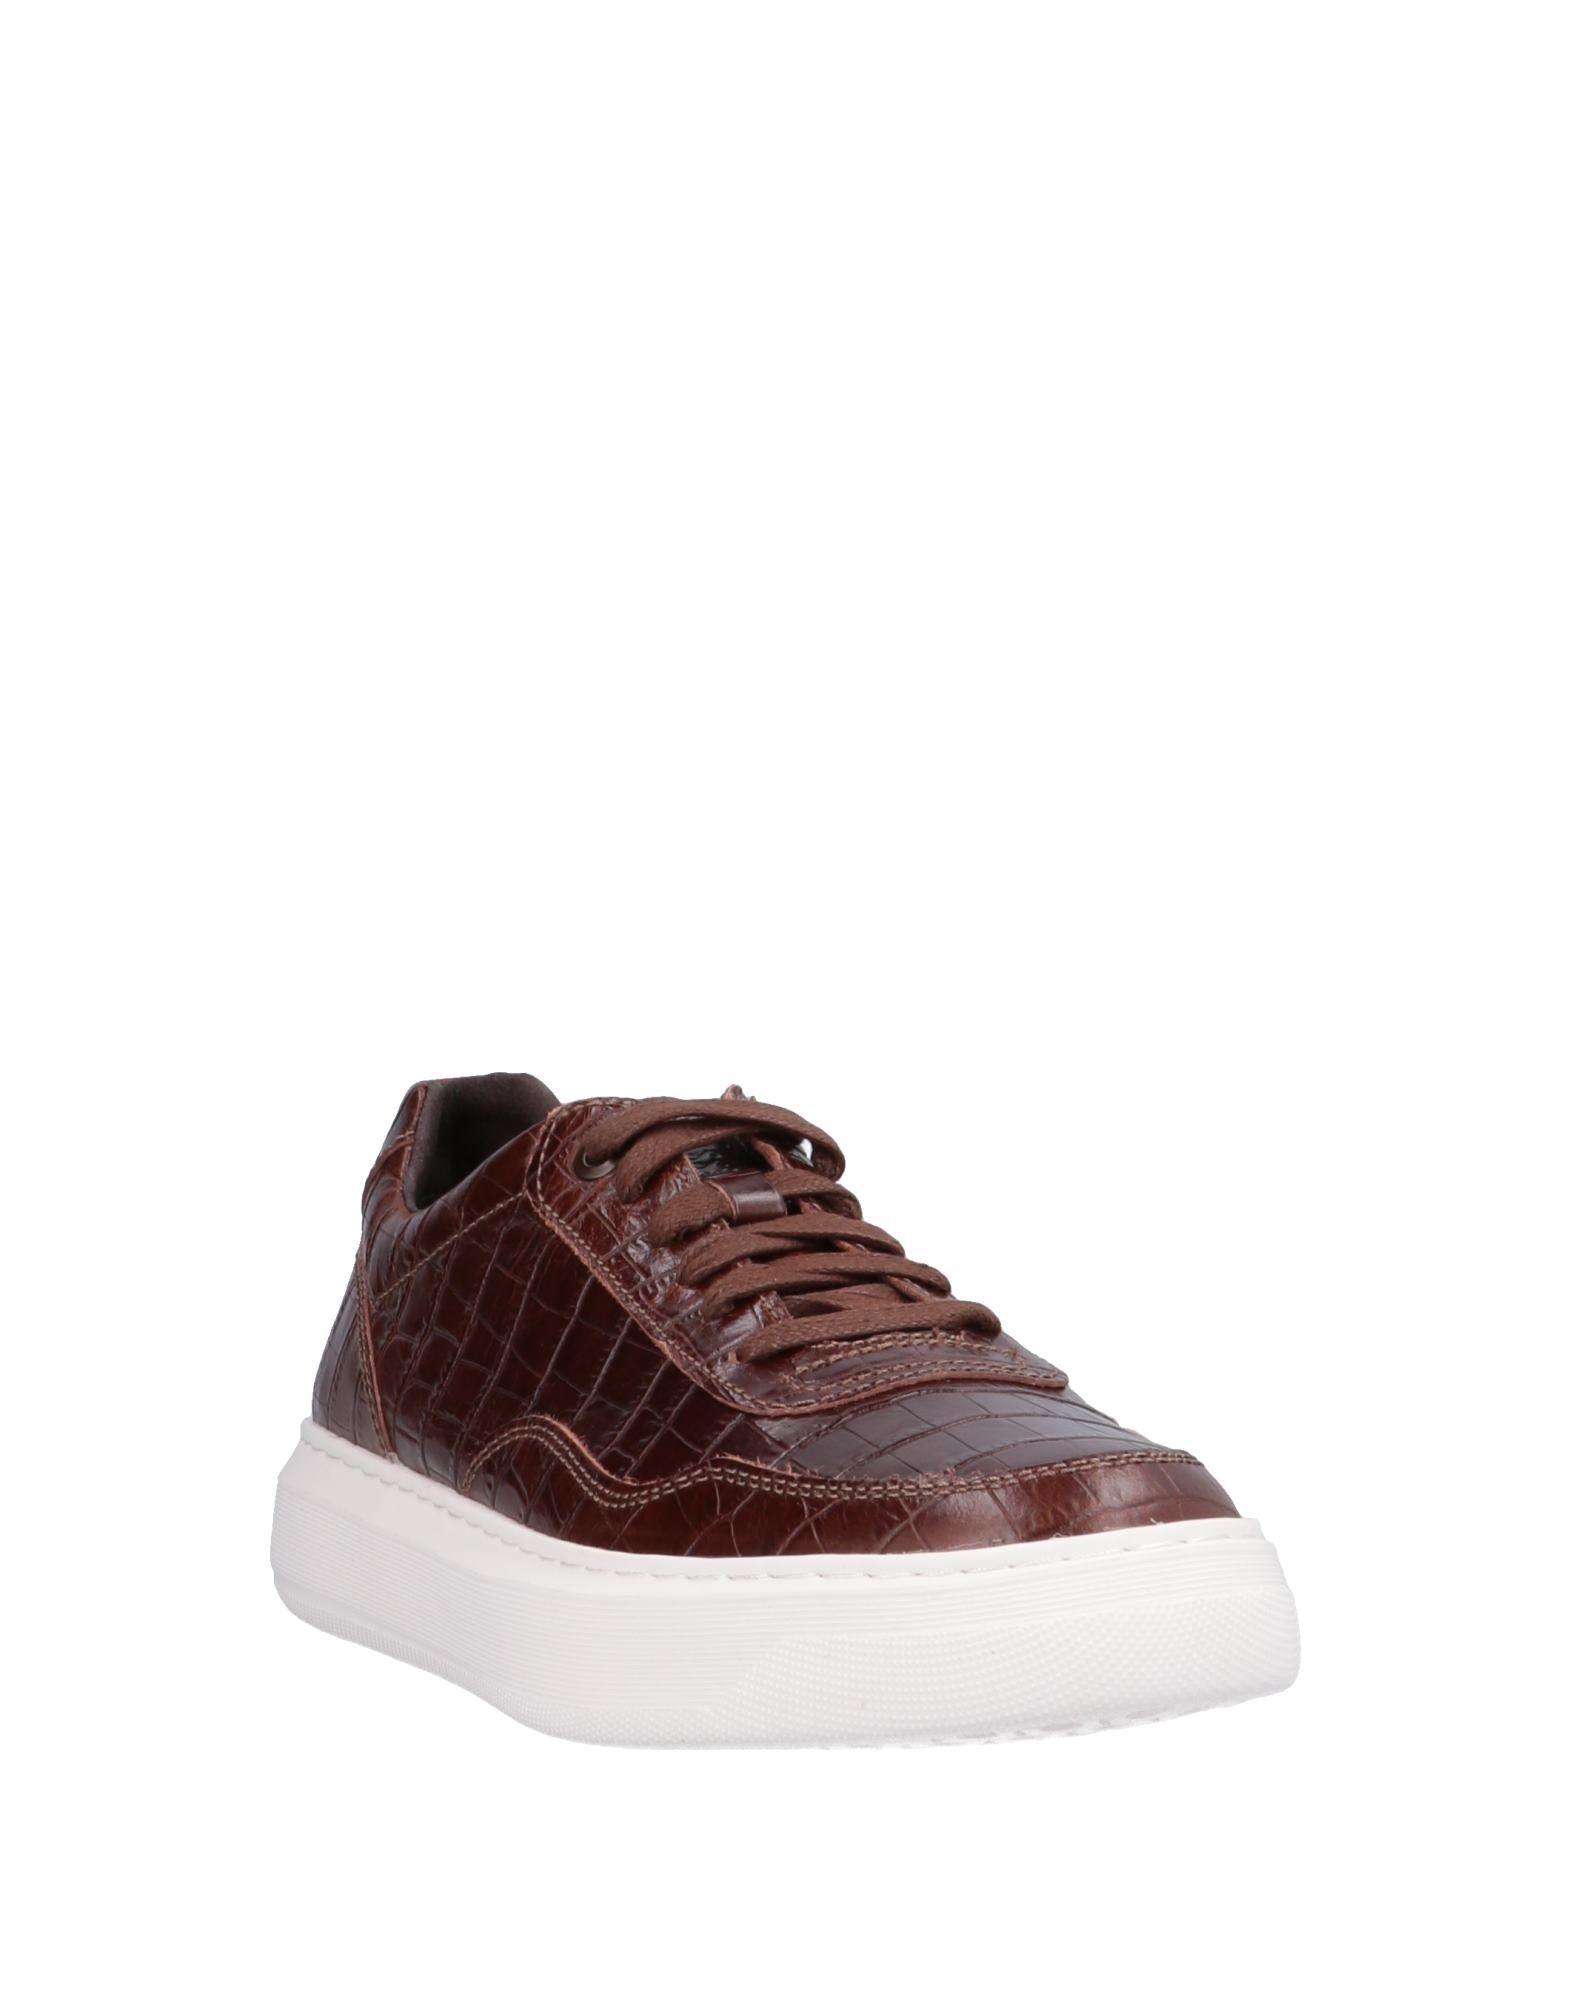 Geox Sneakers - - - Men Geox Sneakers online on  Canada - 11564812HS 4853d0